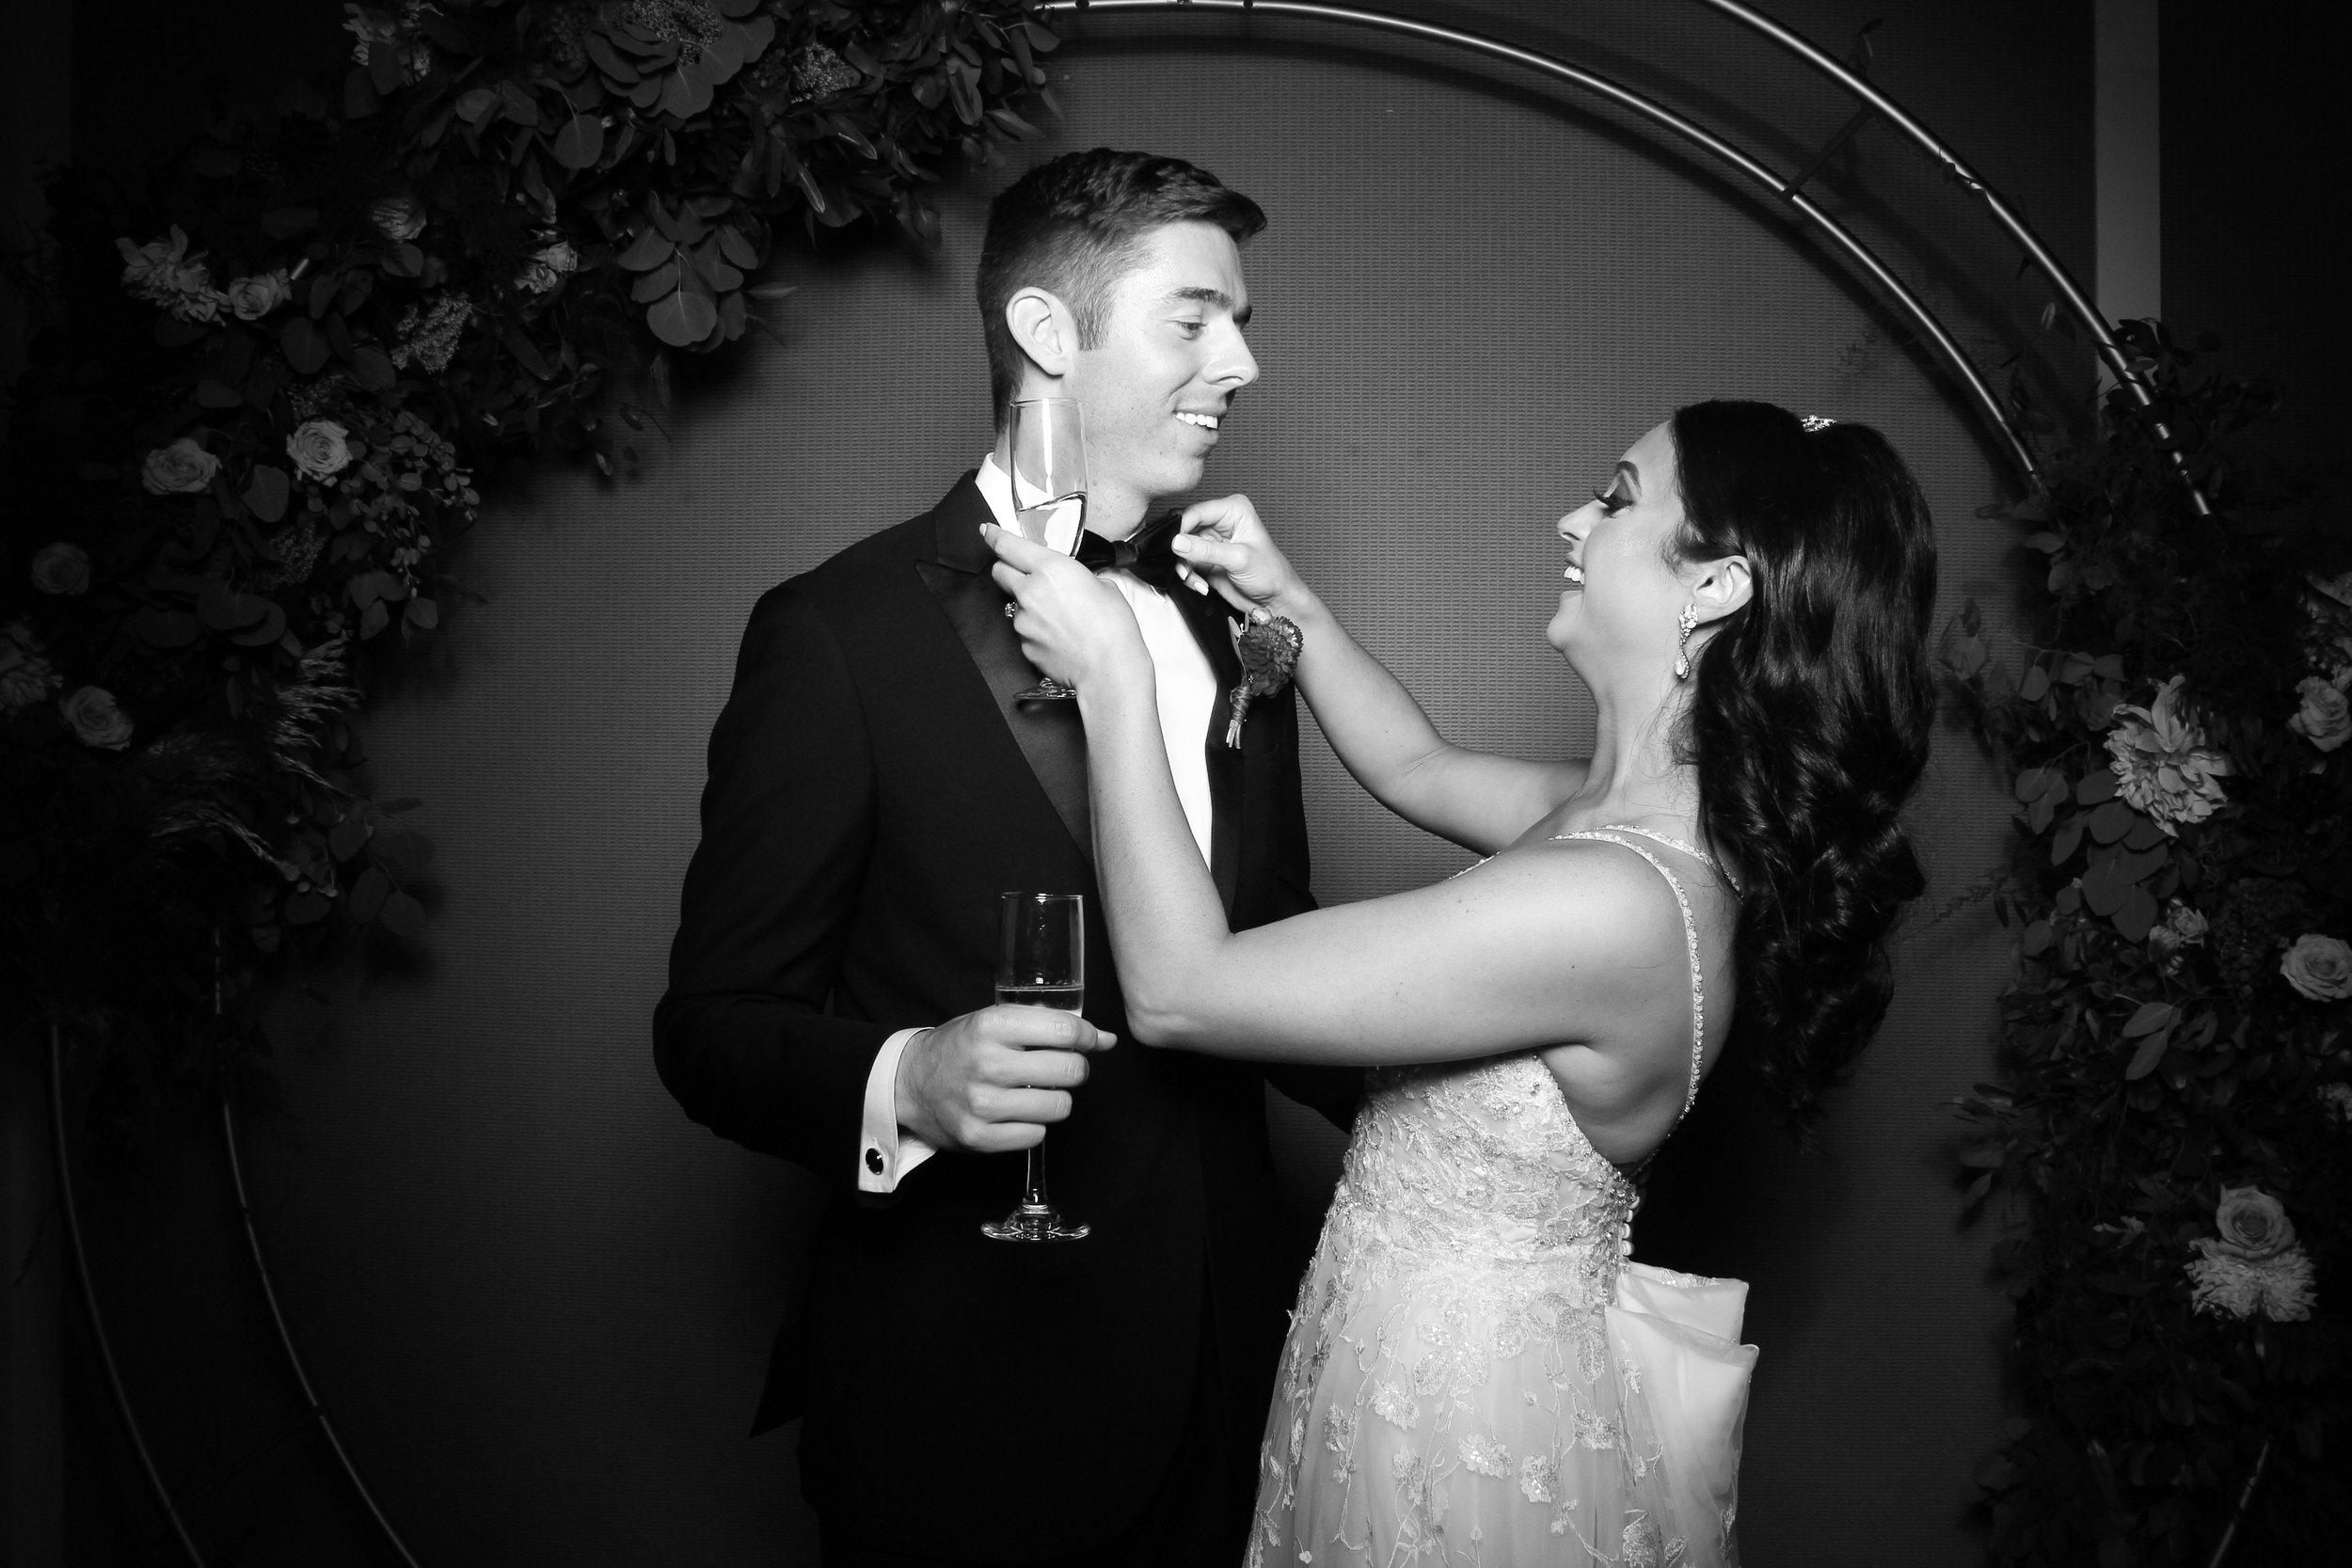 Metropolis_Ballroom_Wedding_Arlington_Heights_Photo_Booth_01.jpg